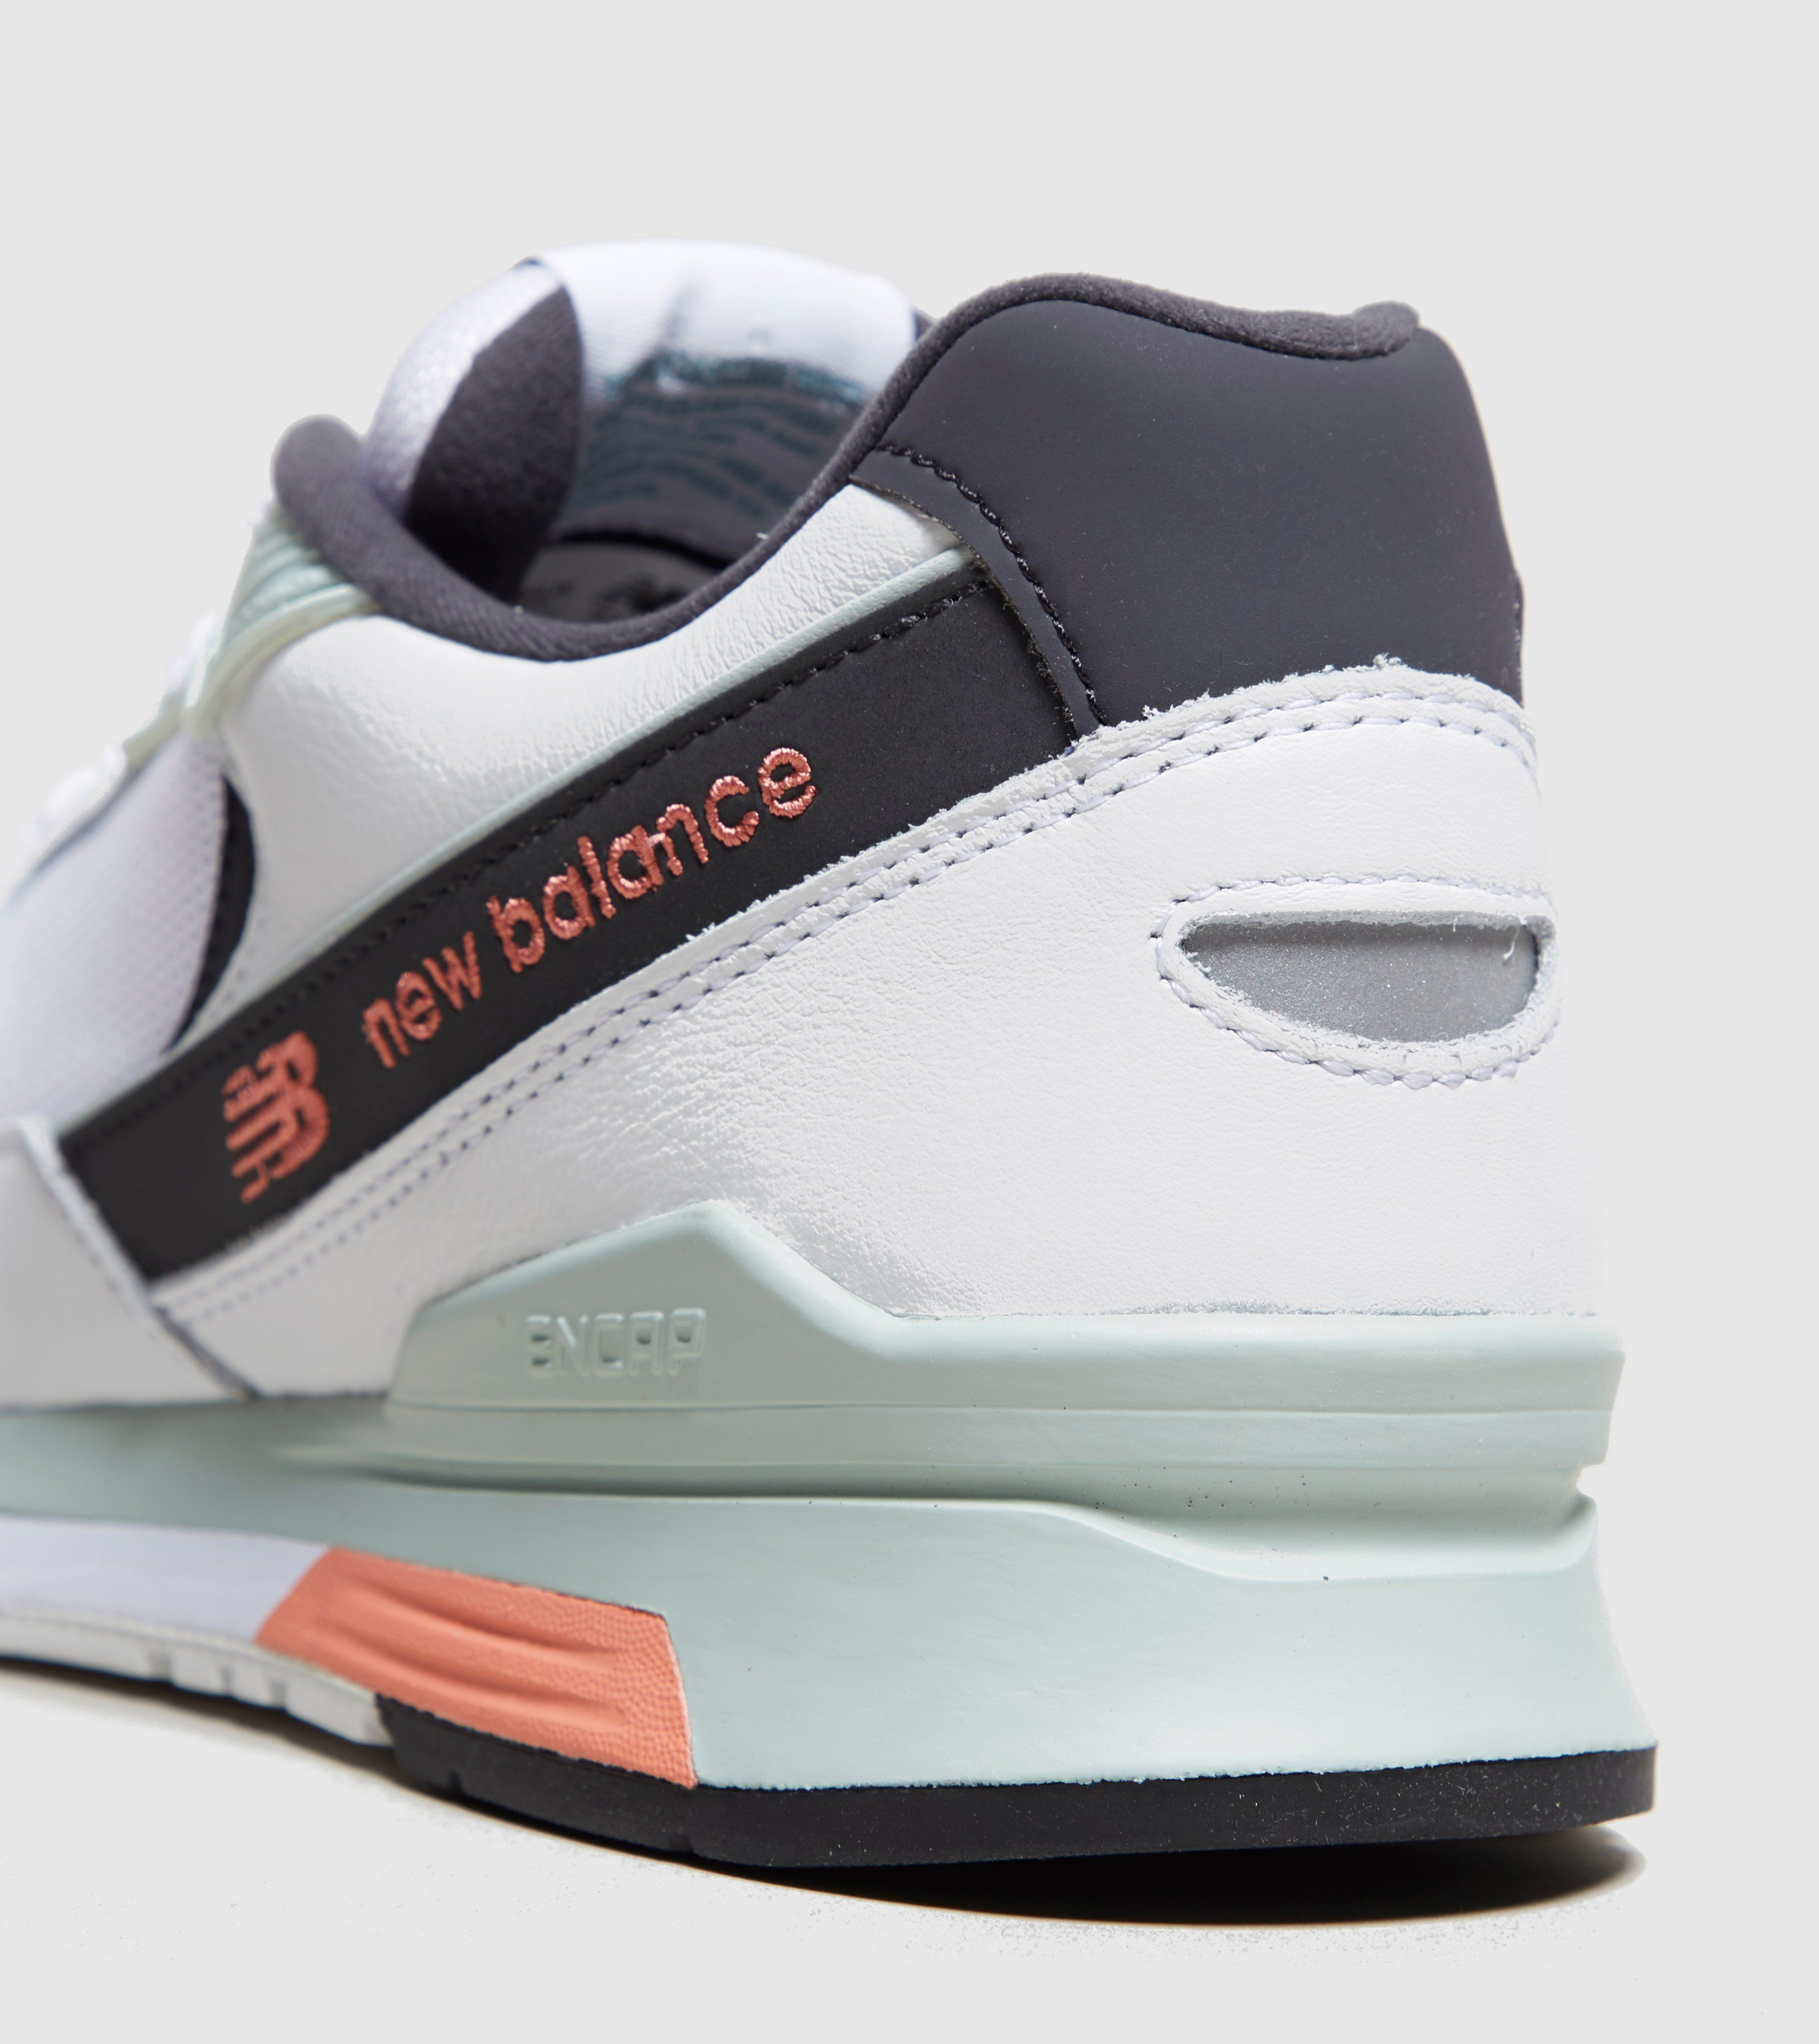 New Balance 99